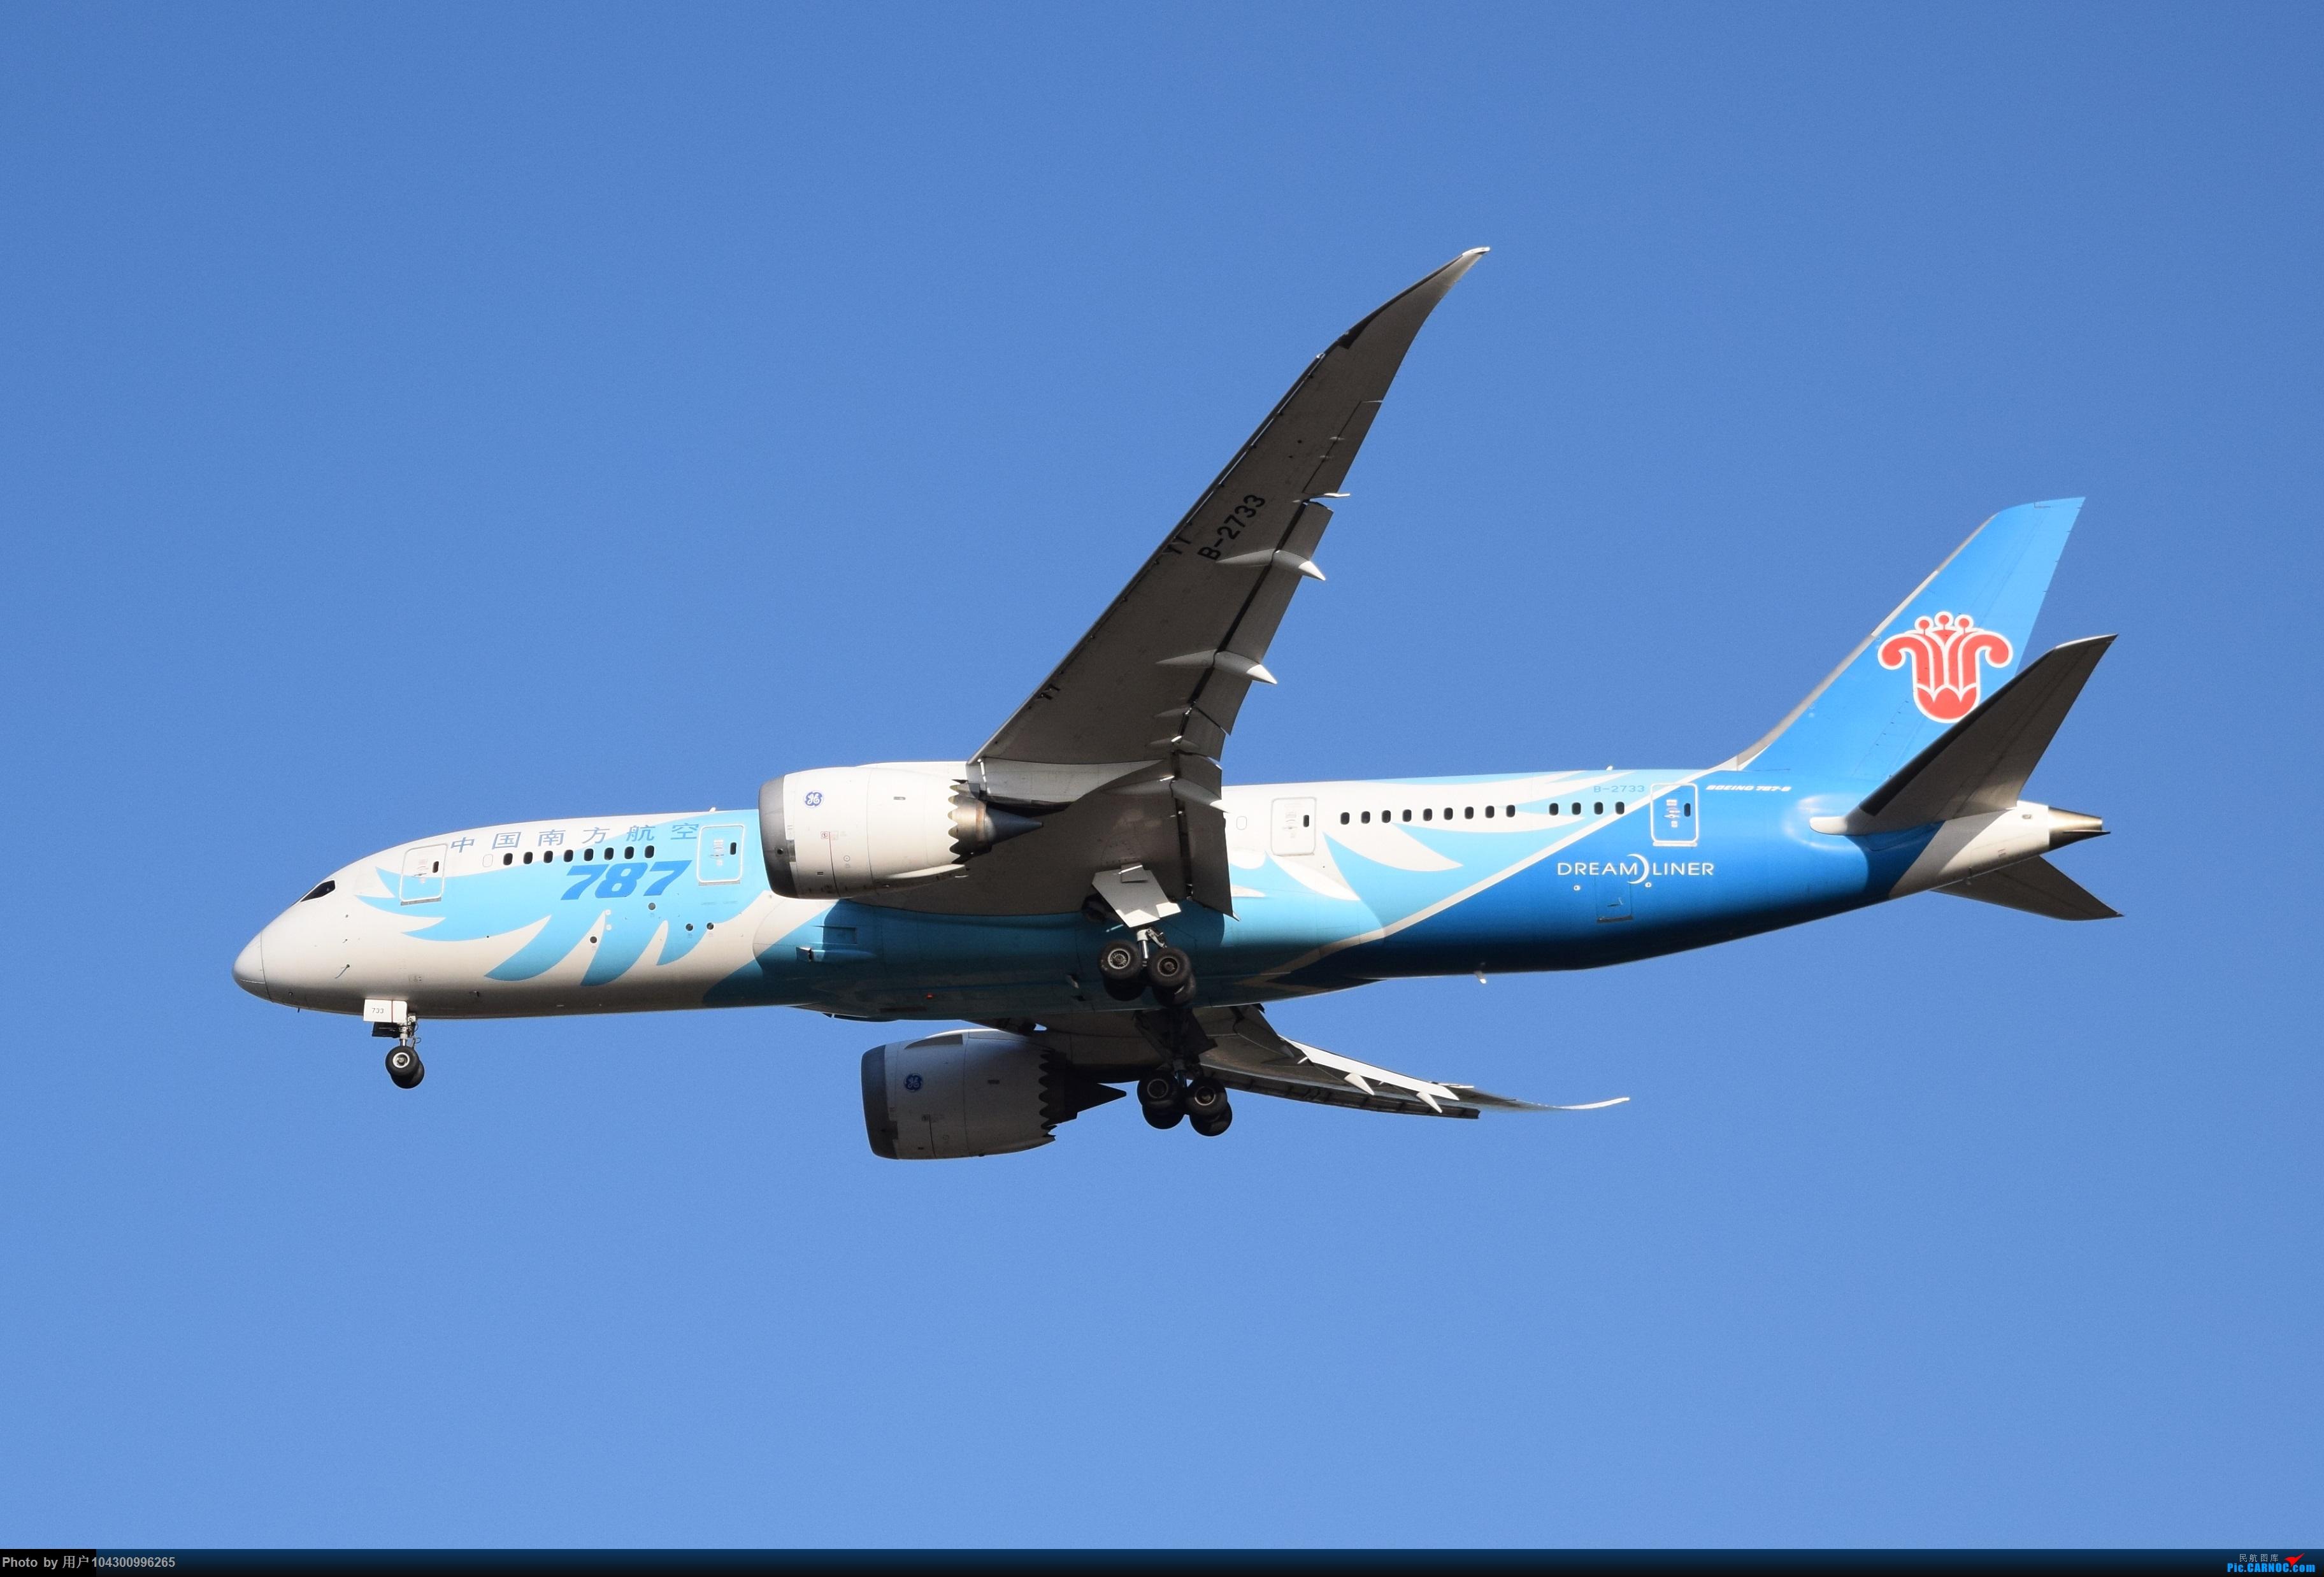 Re:[原创][KWE]贵阳今天天气不错,随便拍几张! BOEING 787-8 B-2733 中国贵阳龙洞堡国际机场